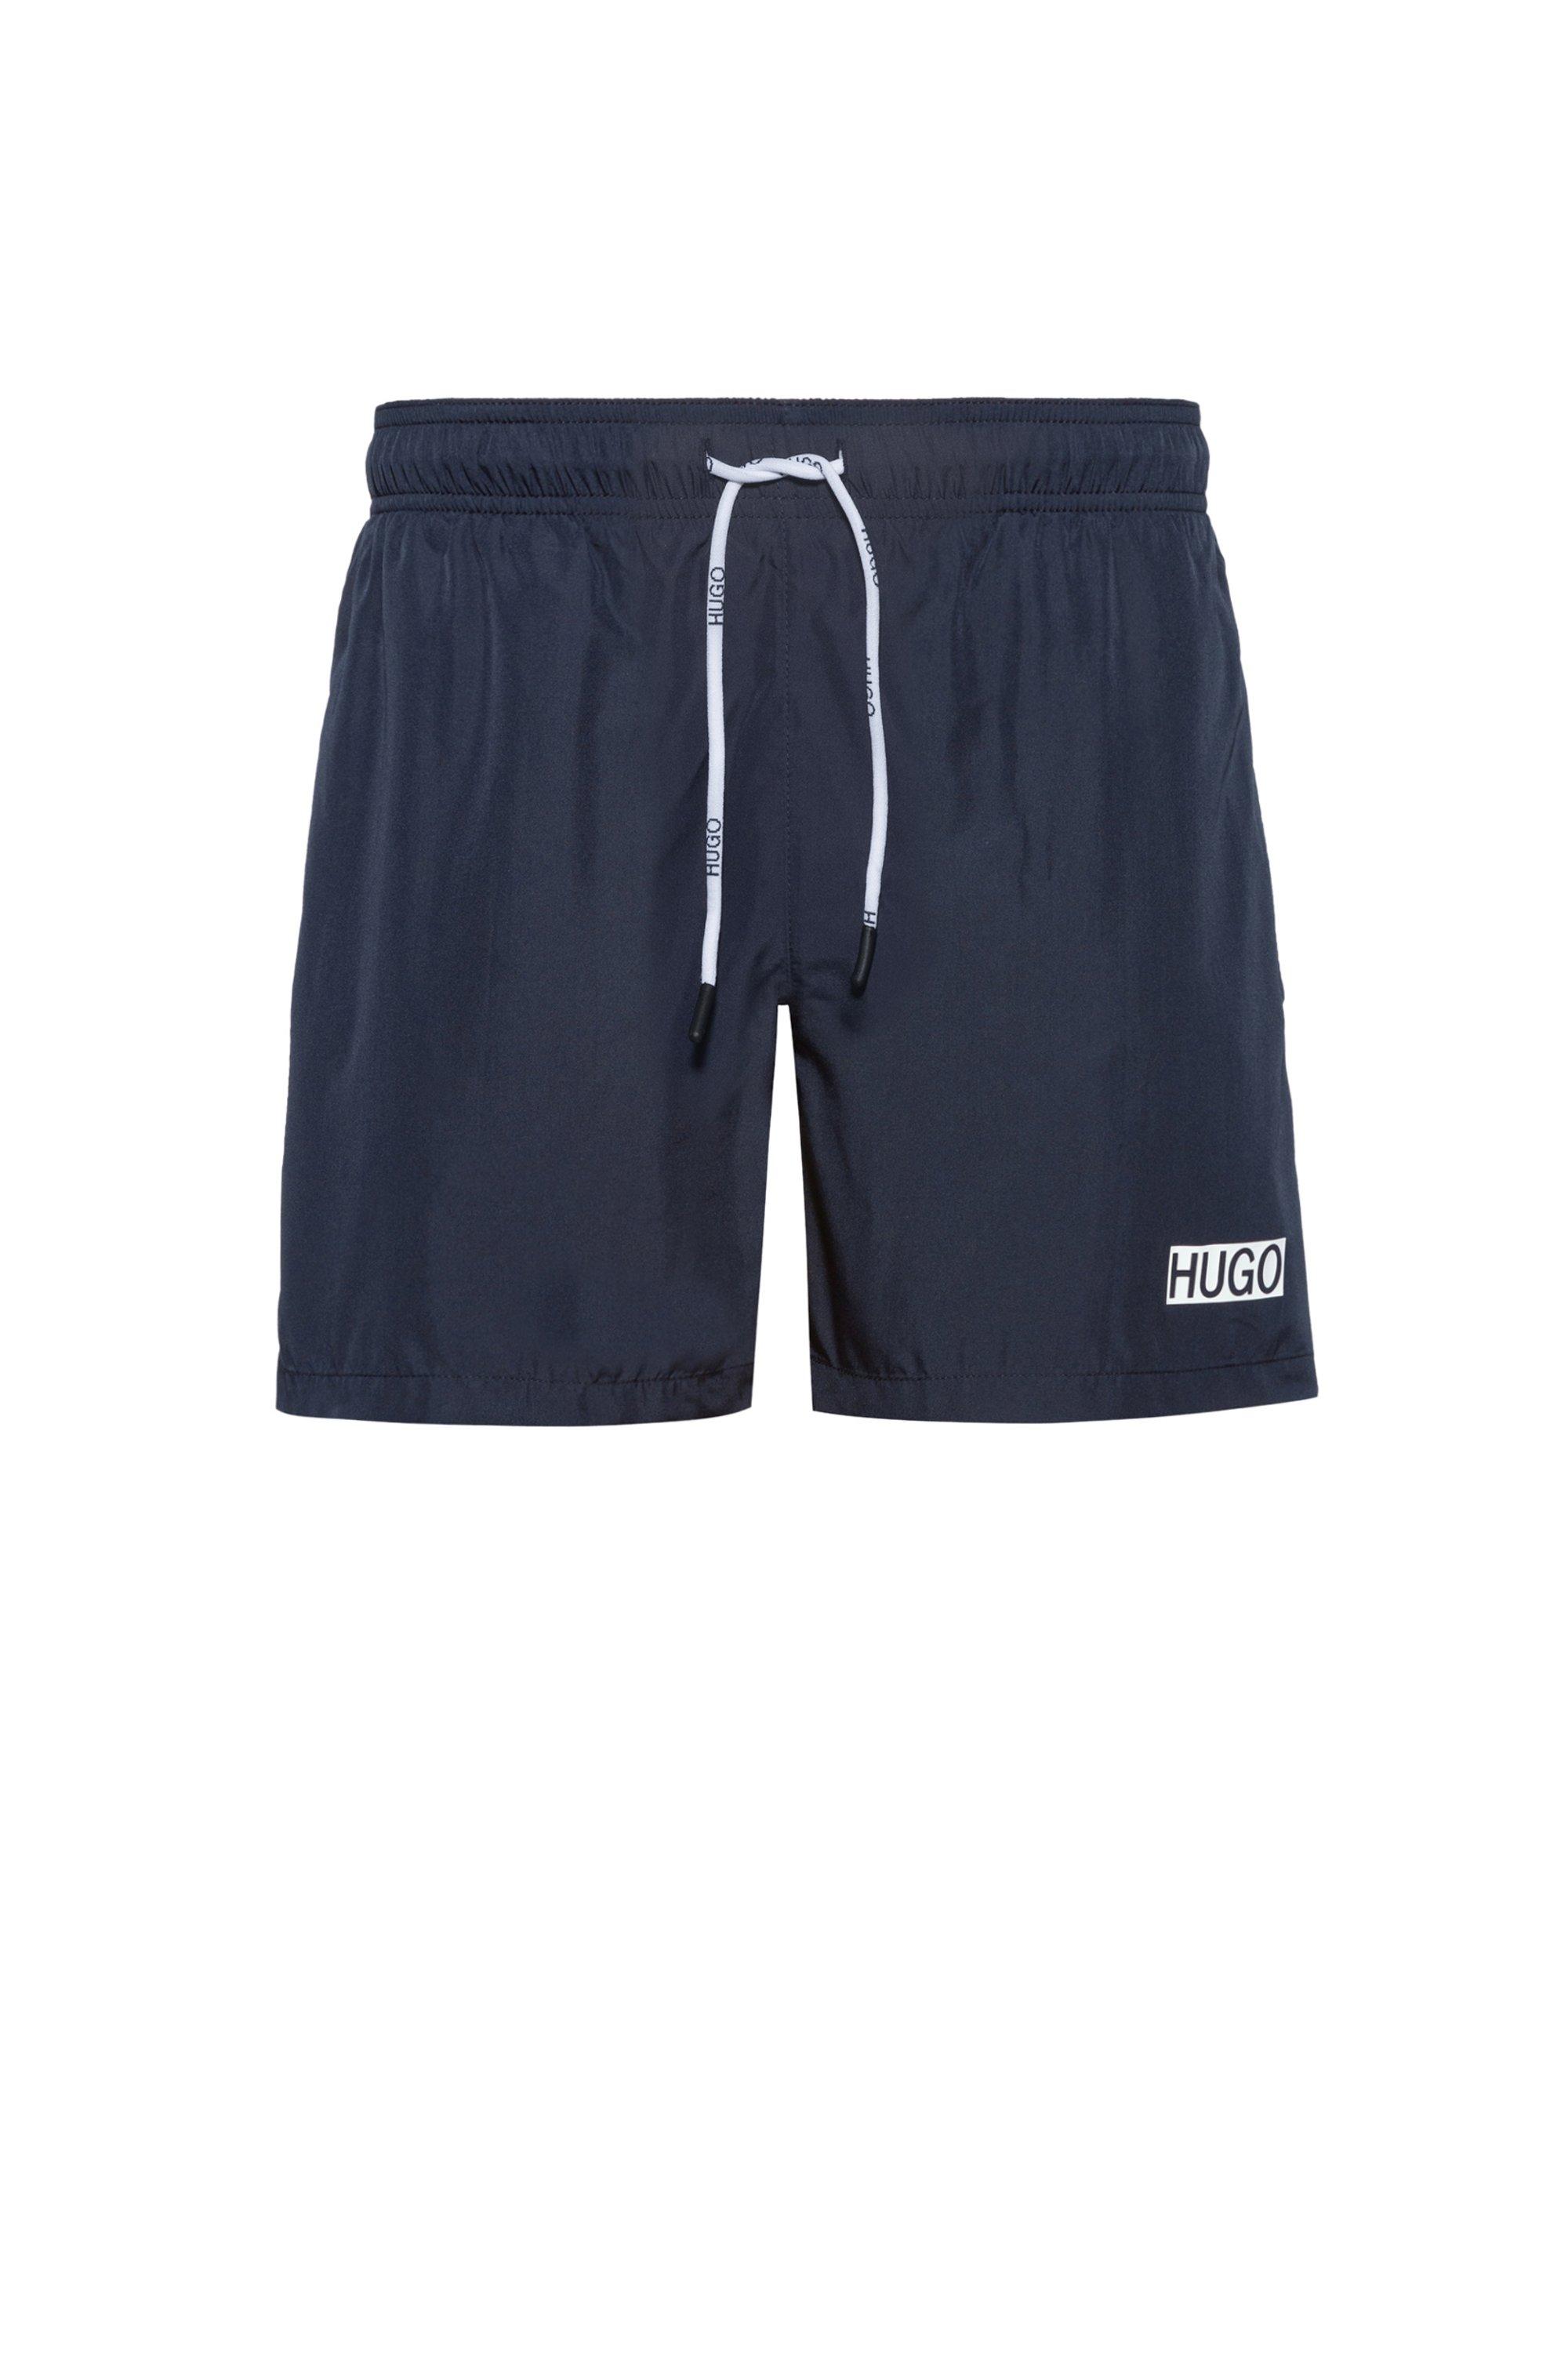 Quick-dry swim shorts with foil-print logo, Dark Blue